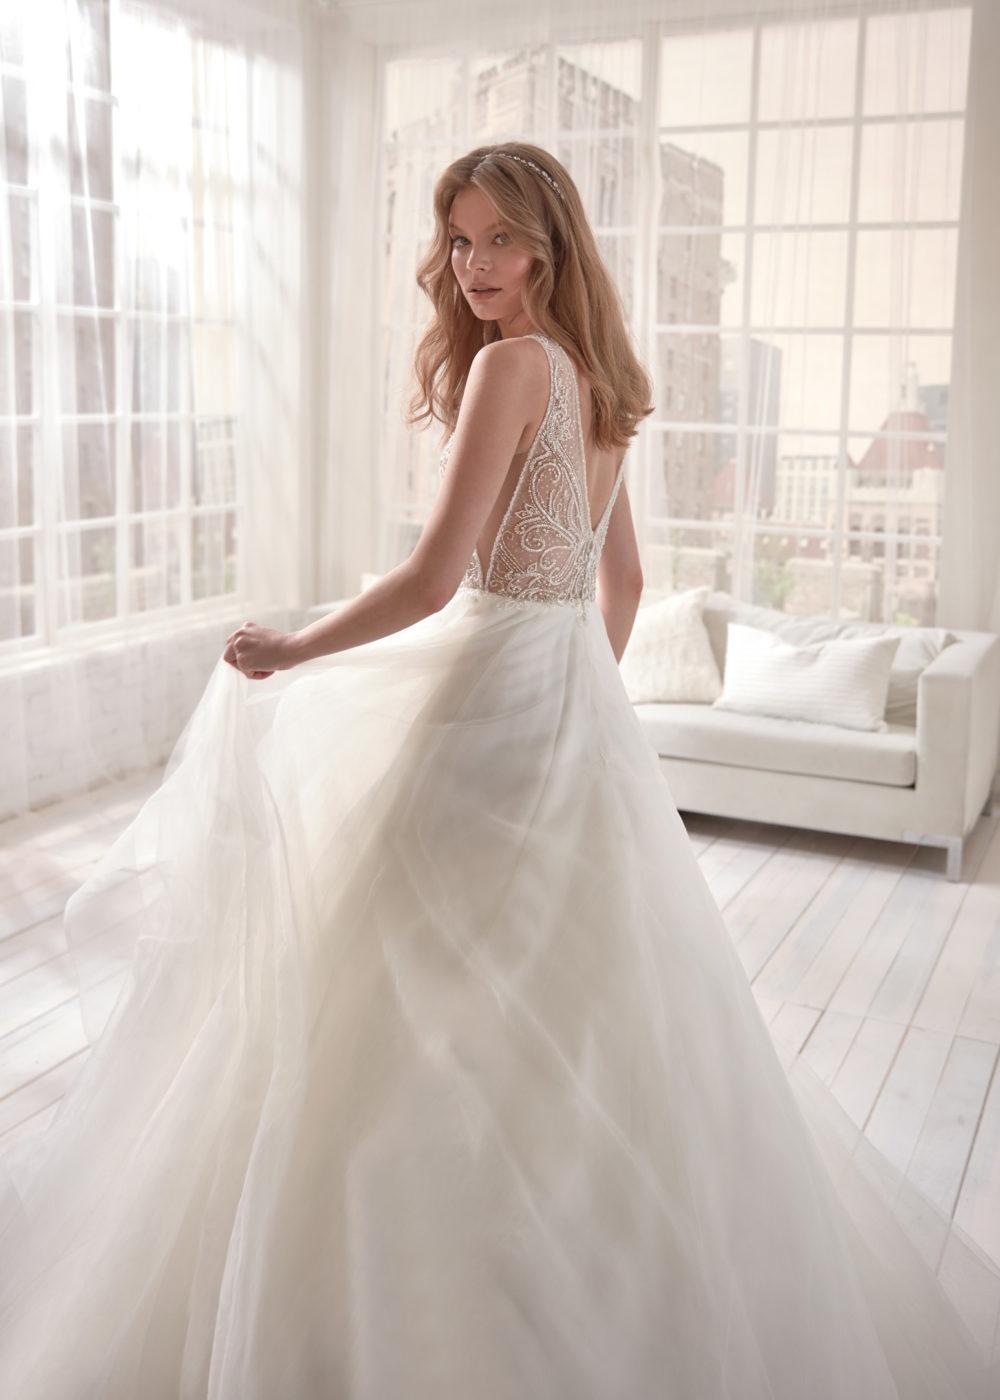 Mariages: abito da sposa Morilee 2020 a Vicenza, Verona, Padova, Veneto JOA20141